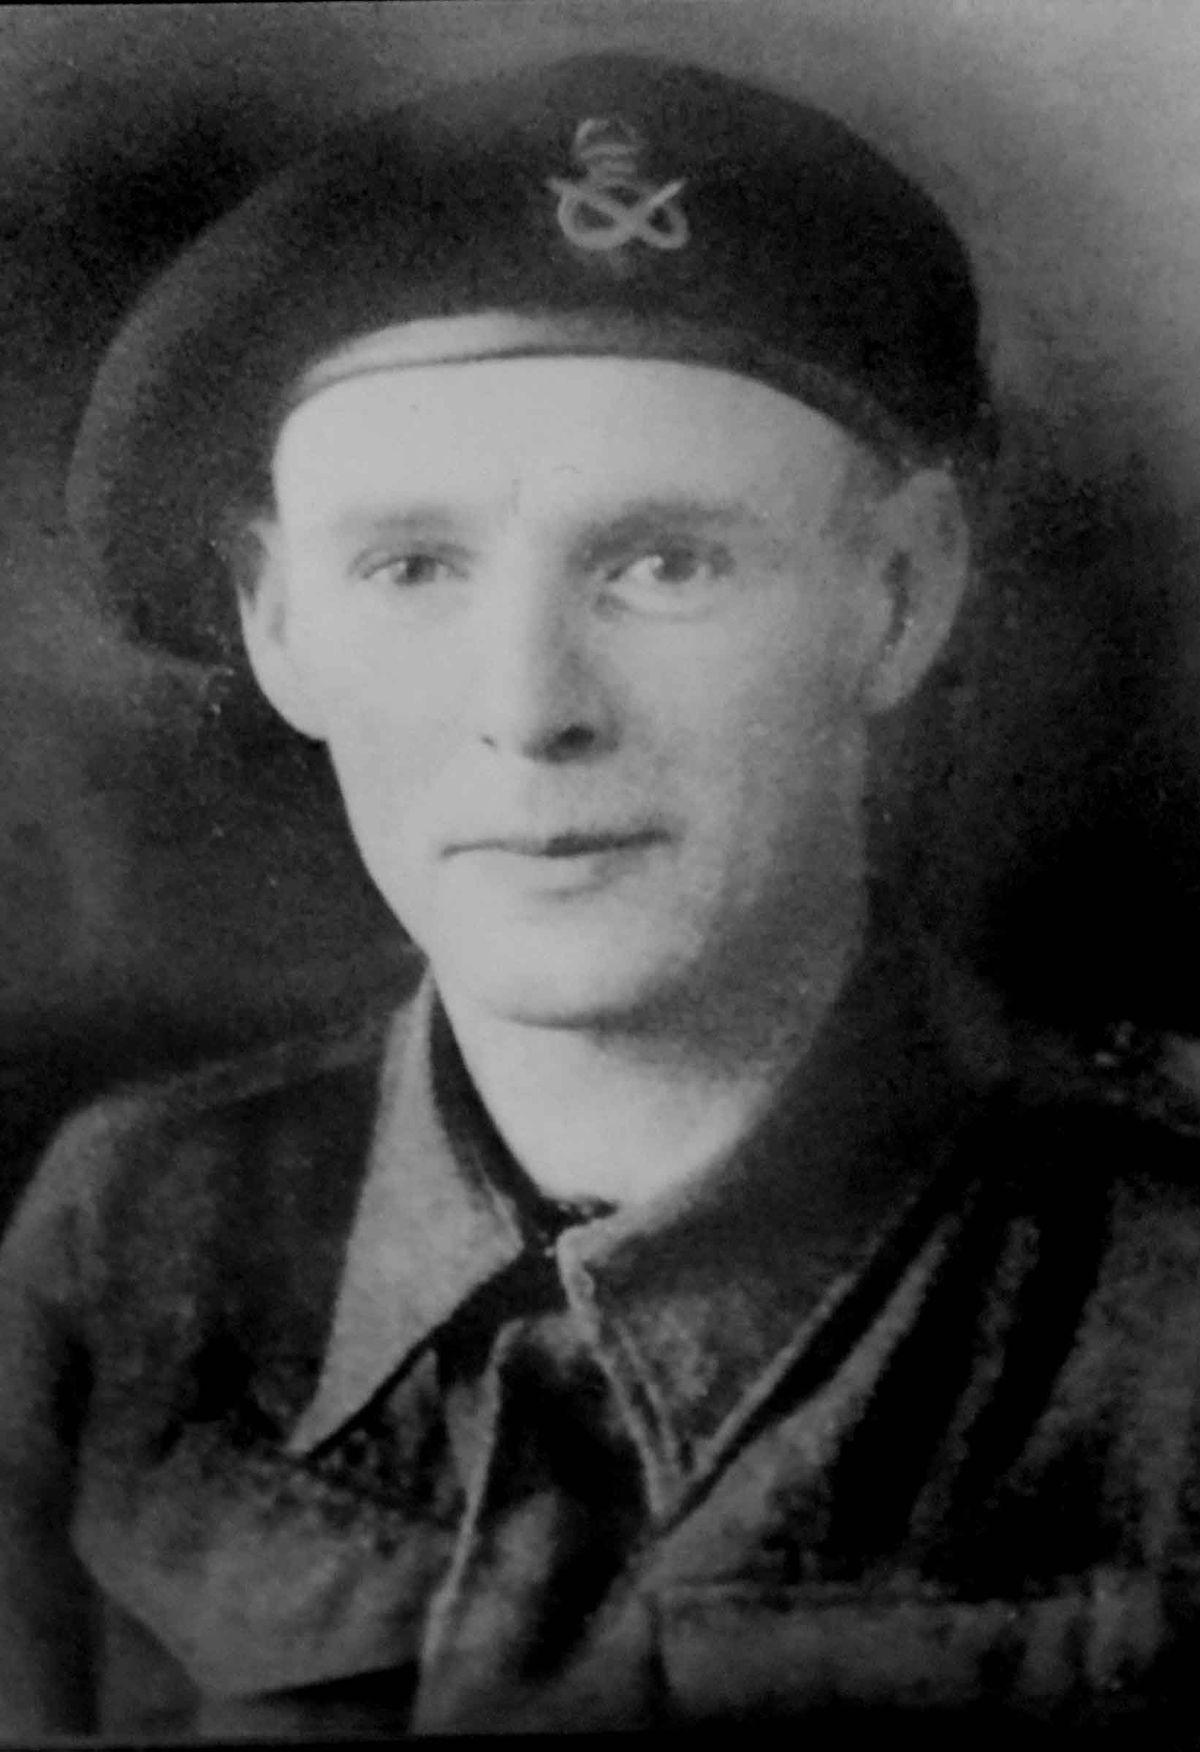 Les Cherrington in his army days